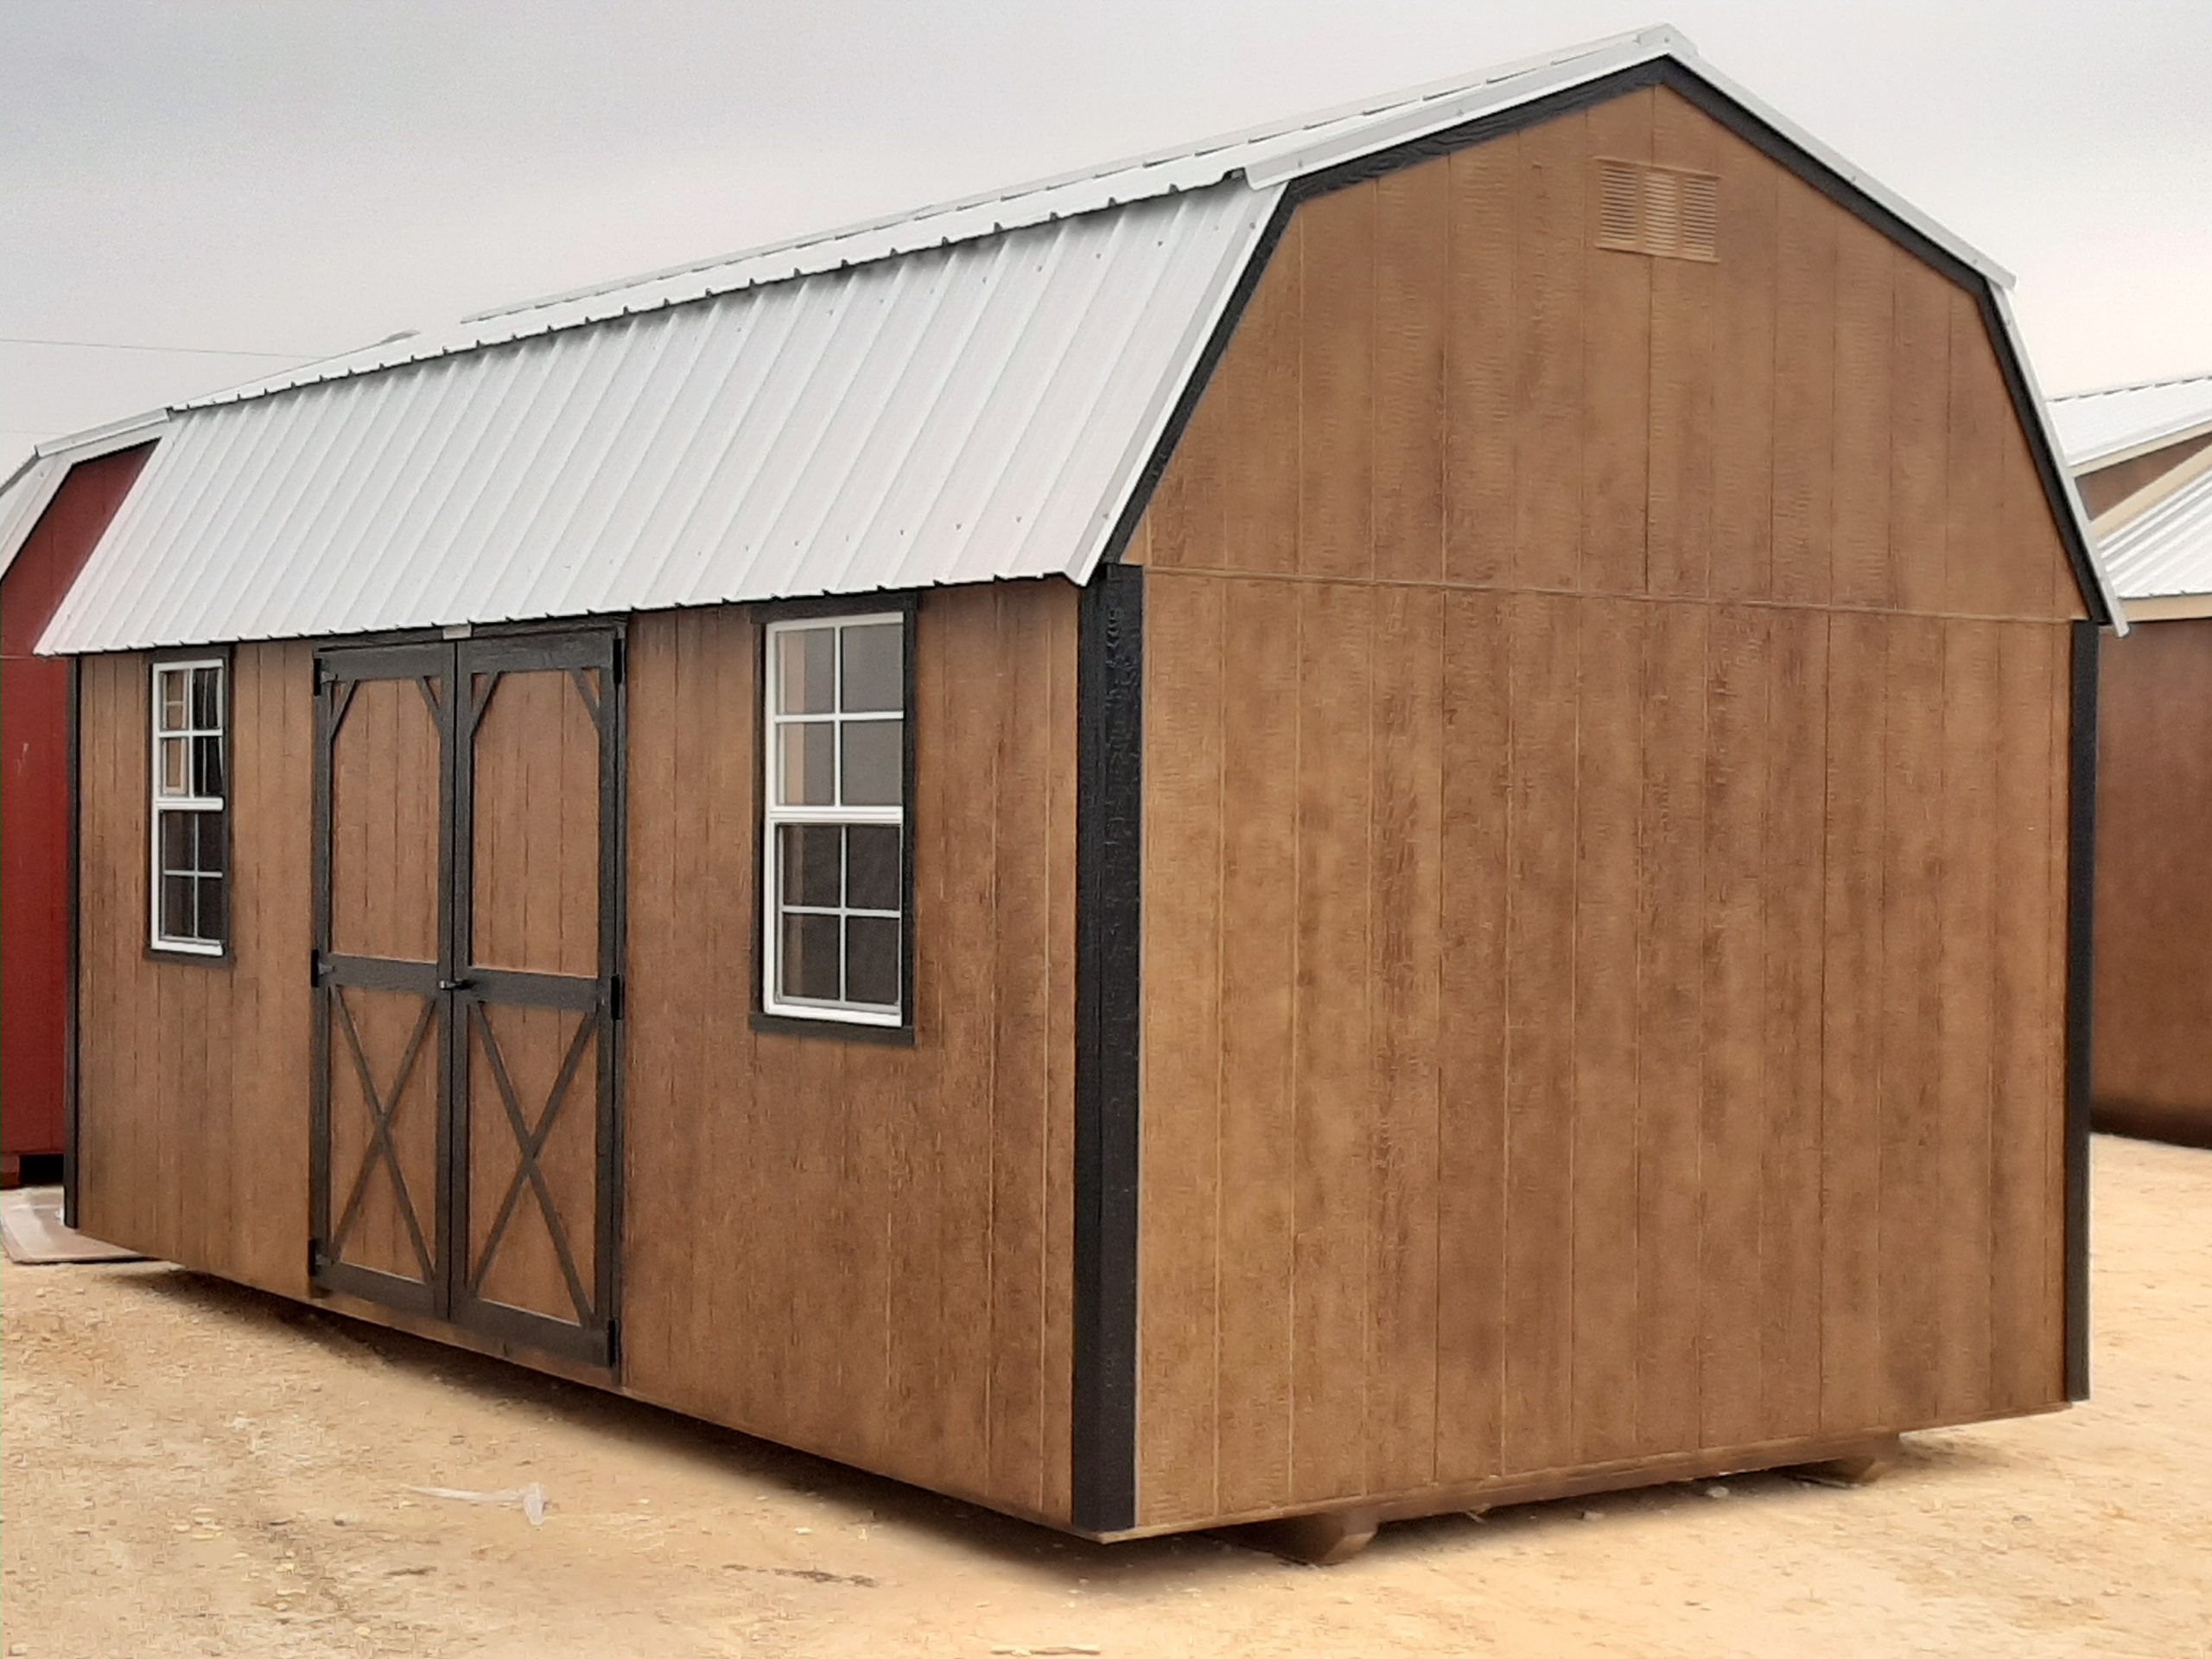 10x20 Lofted Barn Image